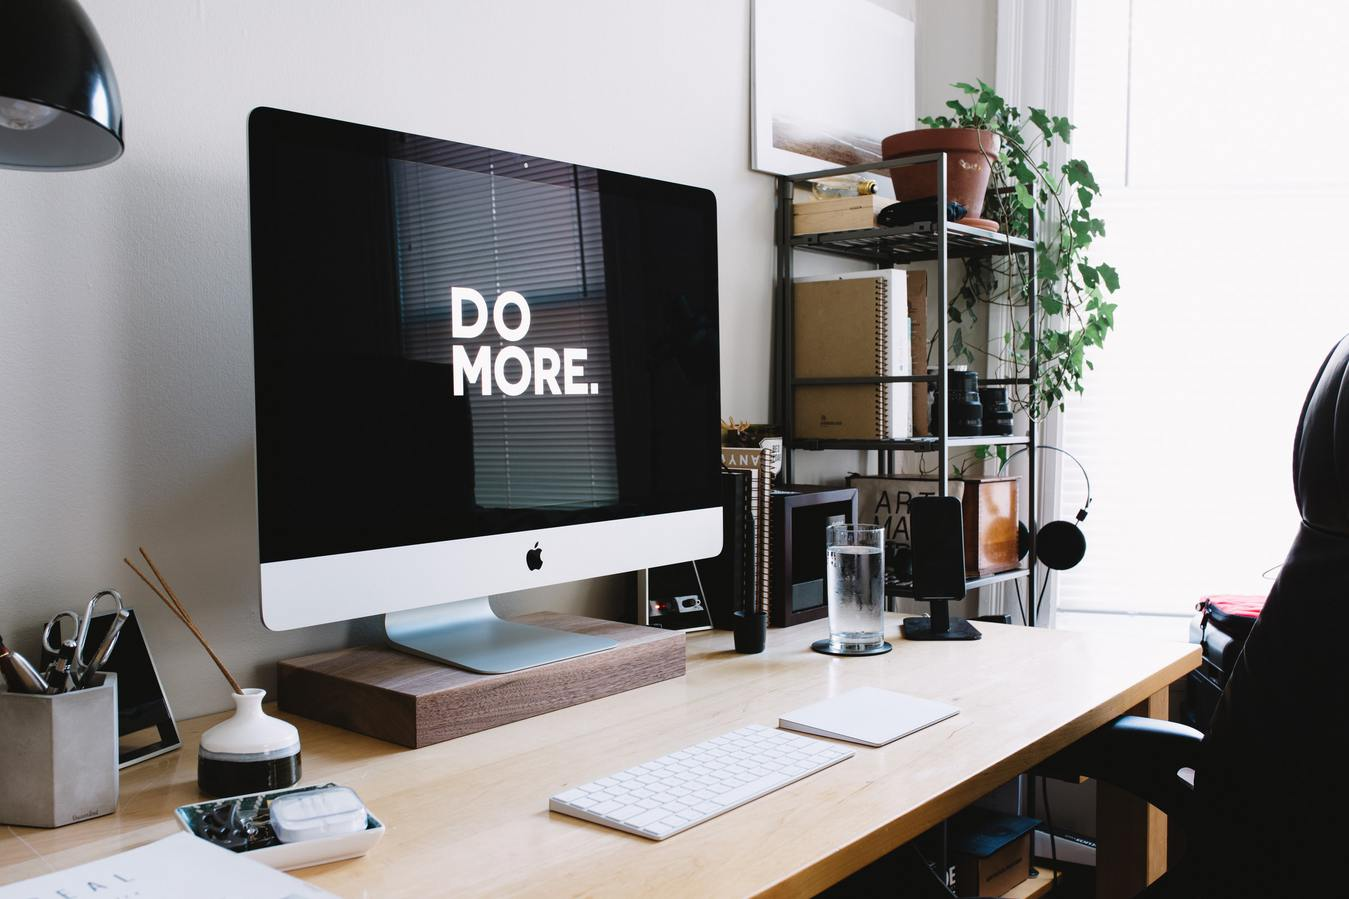 iMac na biurku z kilkoma półkami